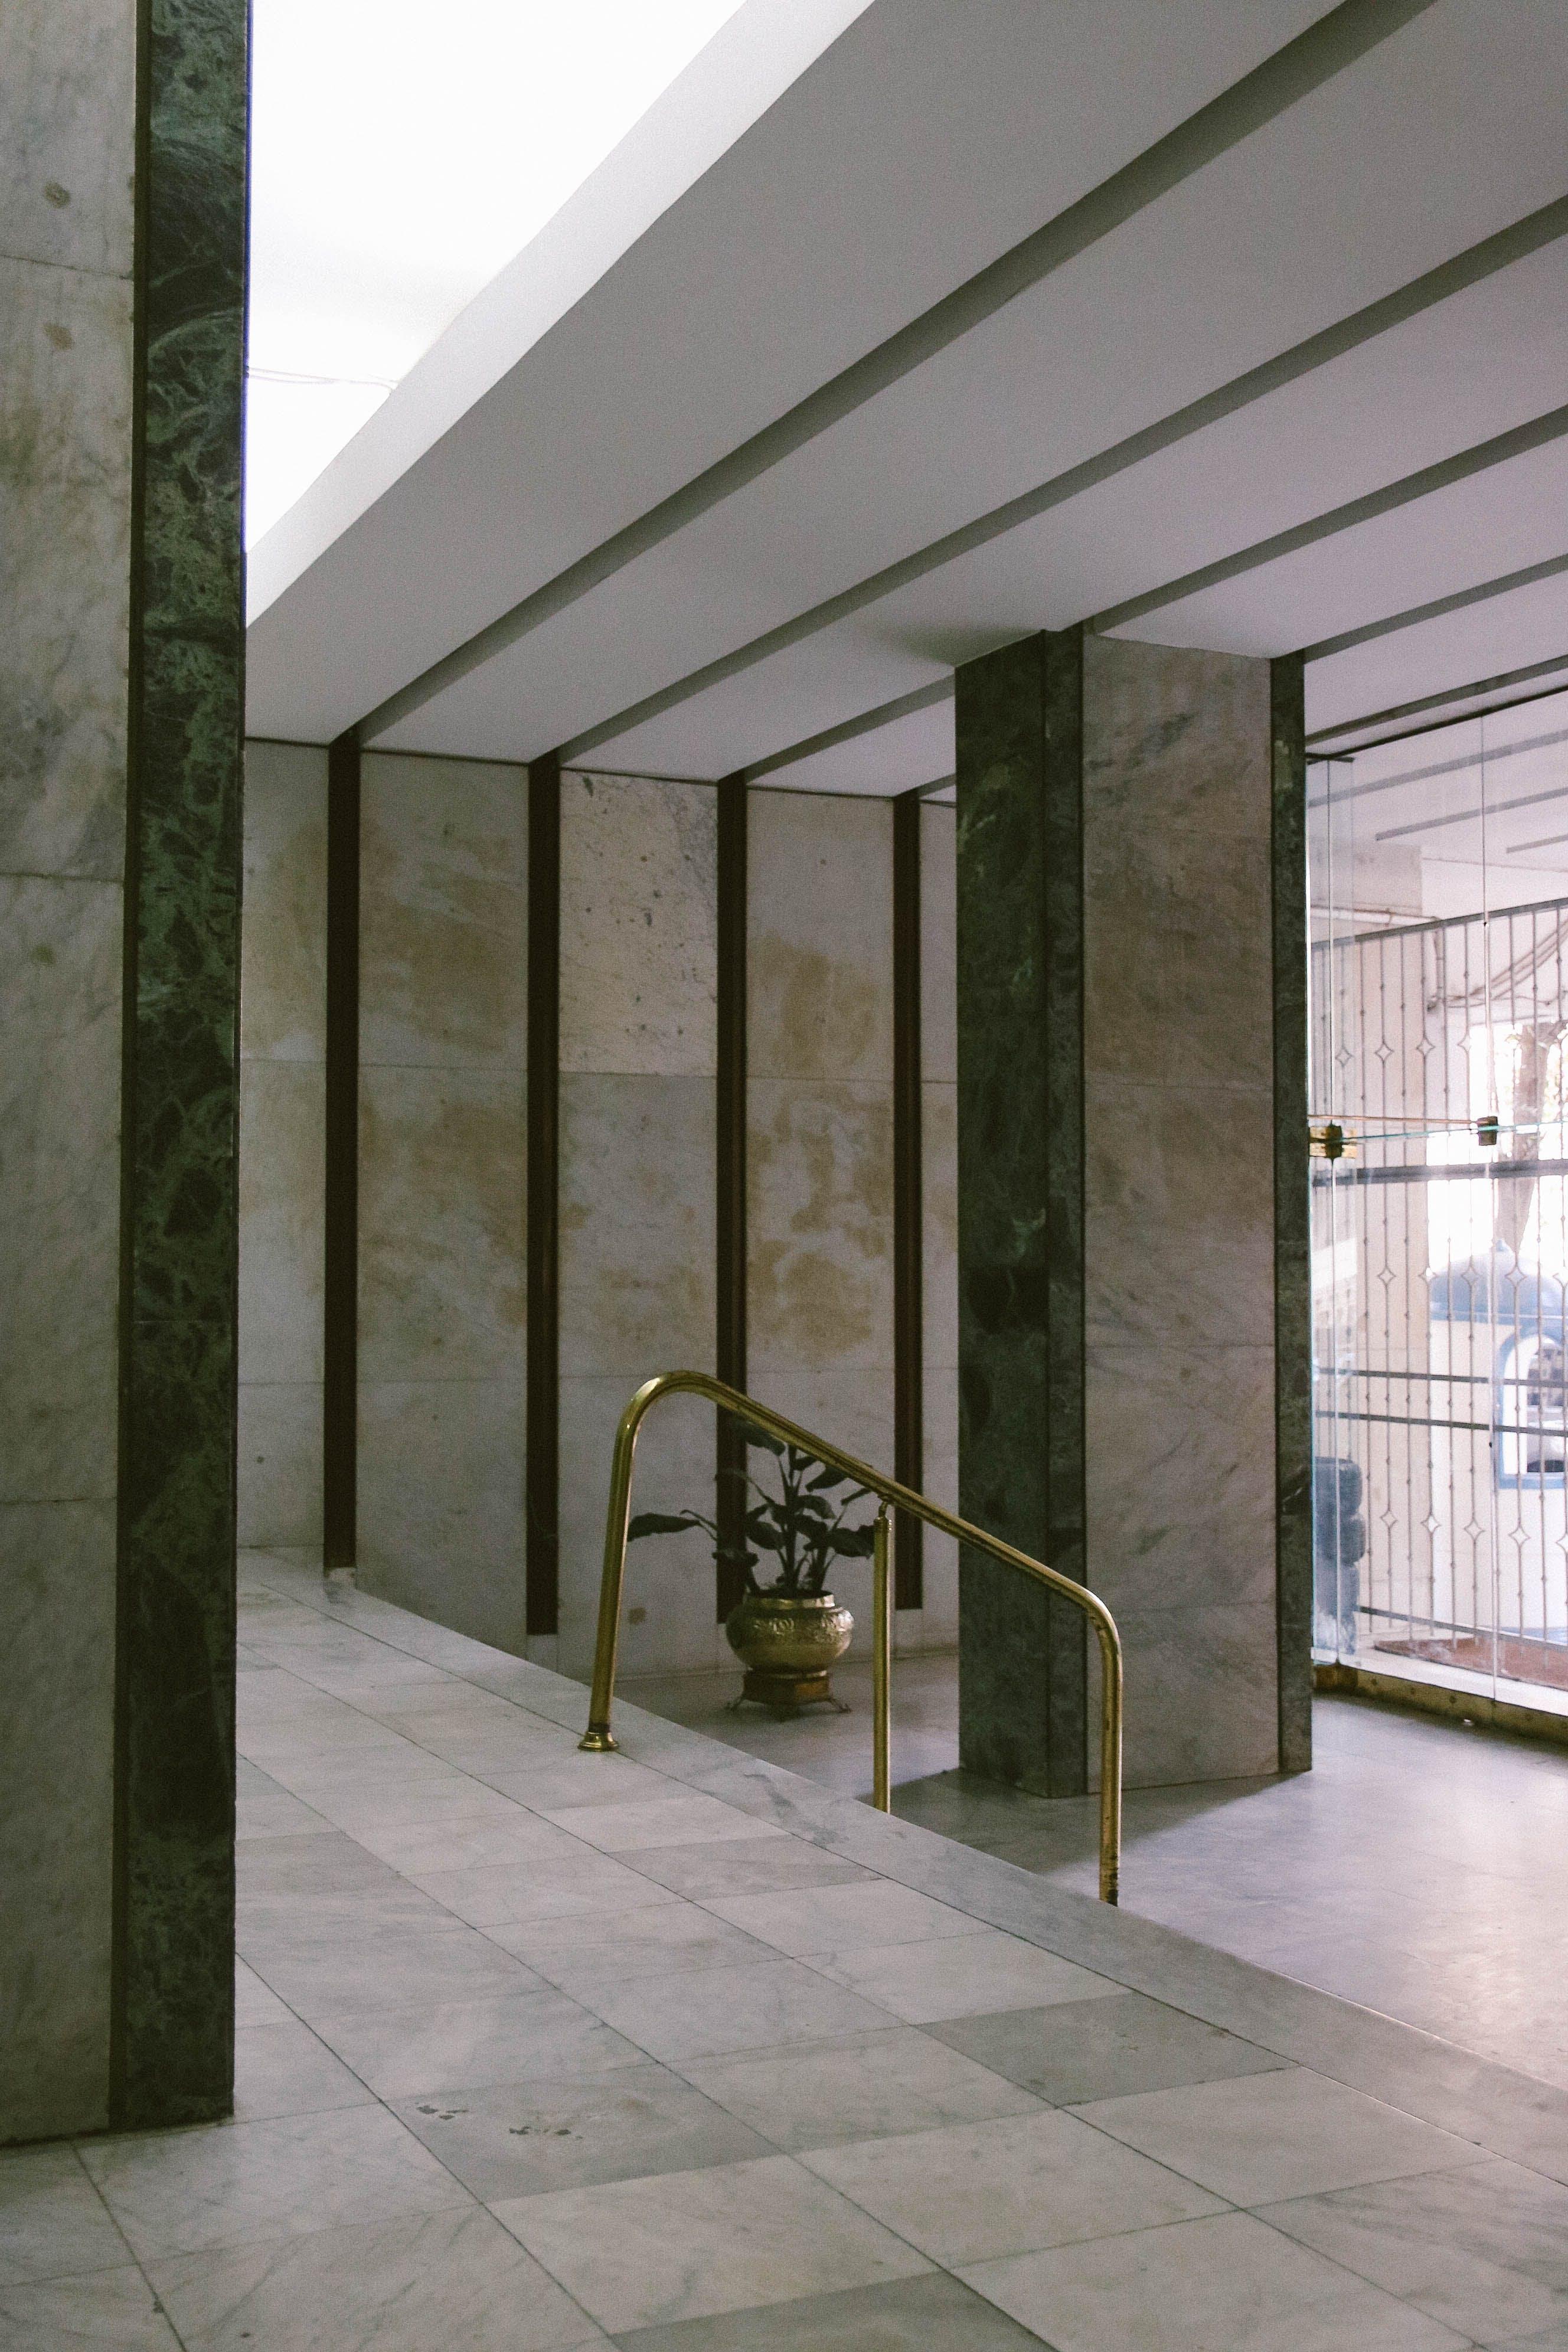 Free stock photo of copper, copper handrail, entrance, hallway